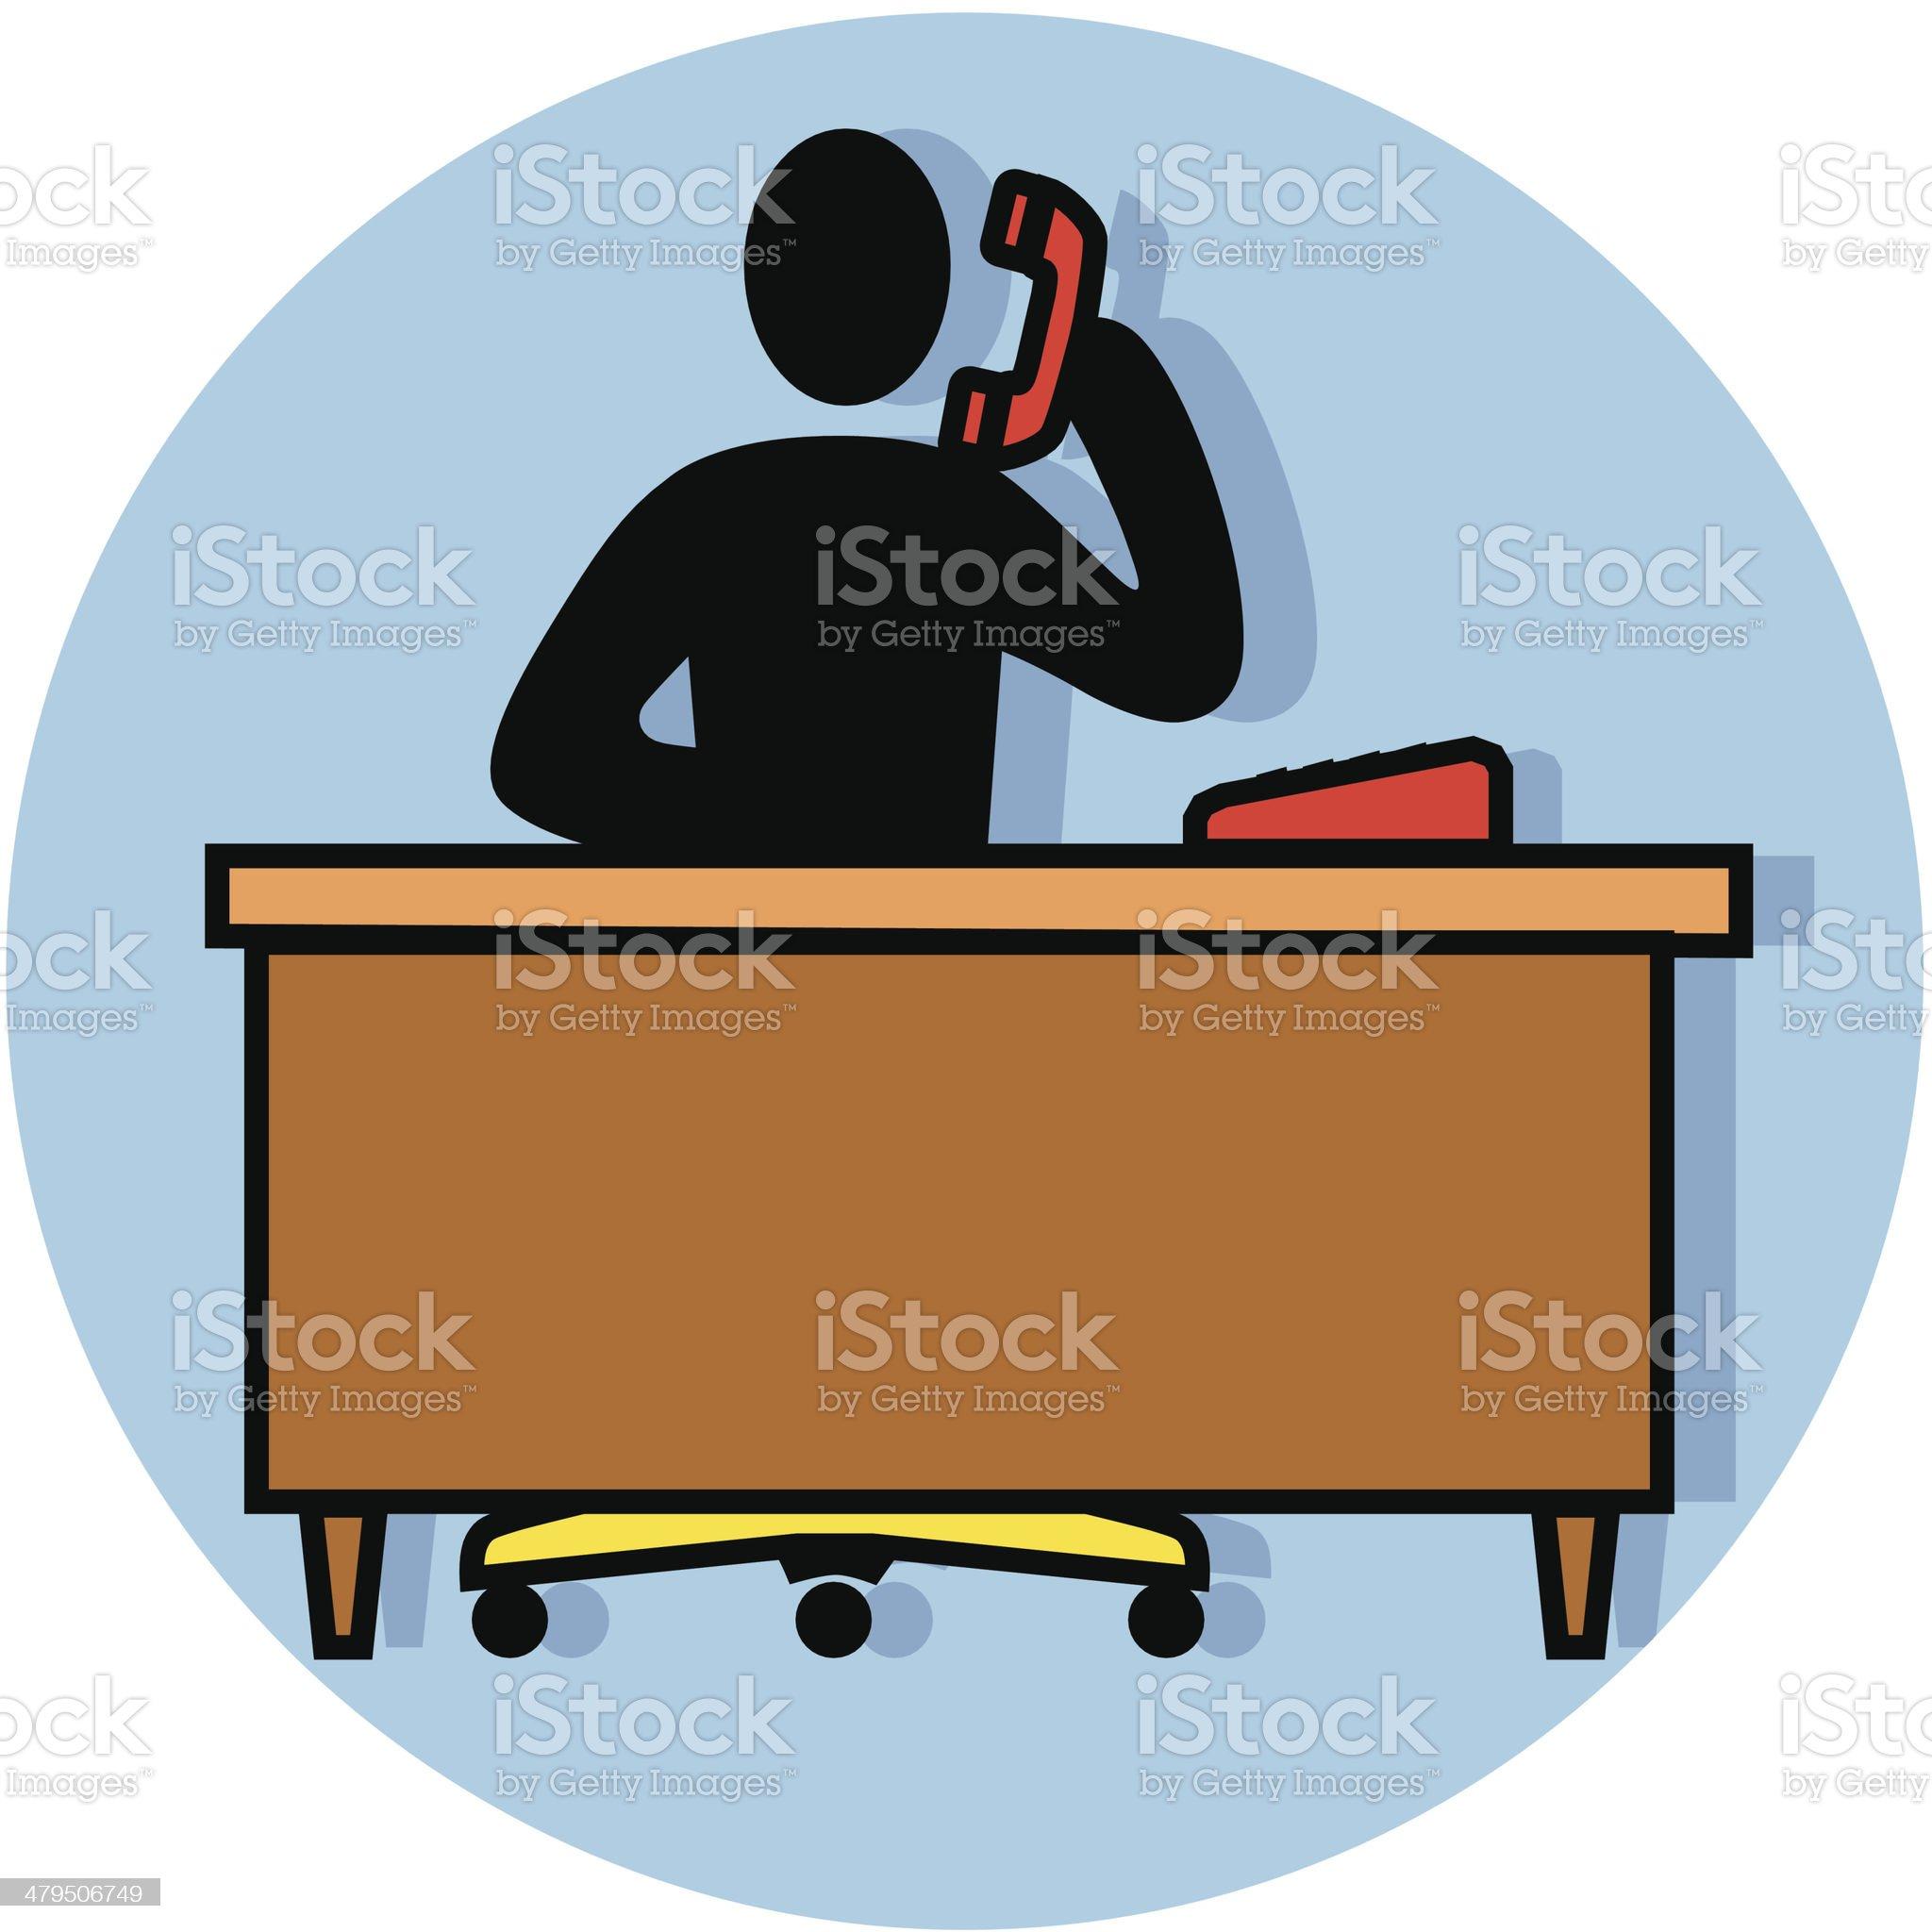 employee phone call icon royalty-free stock vector art